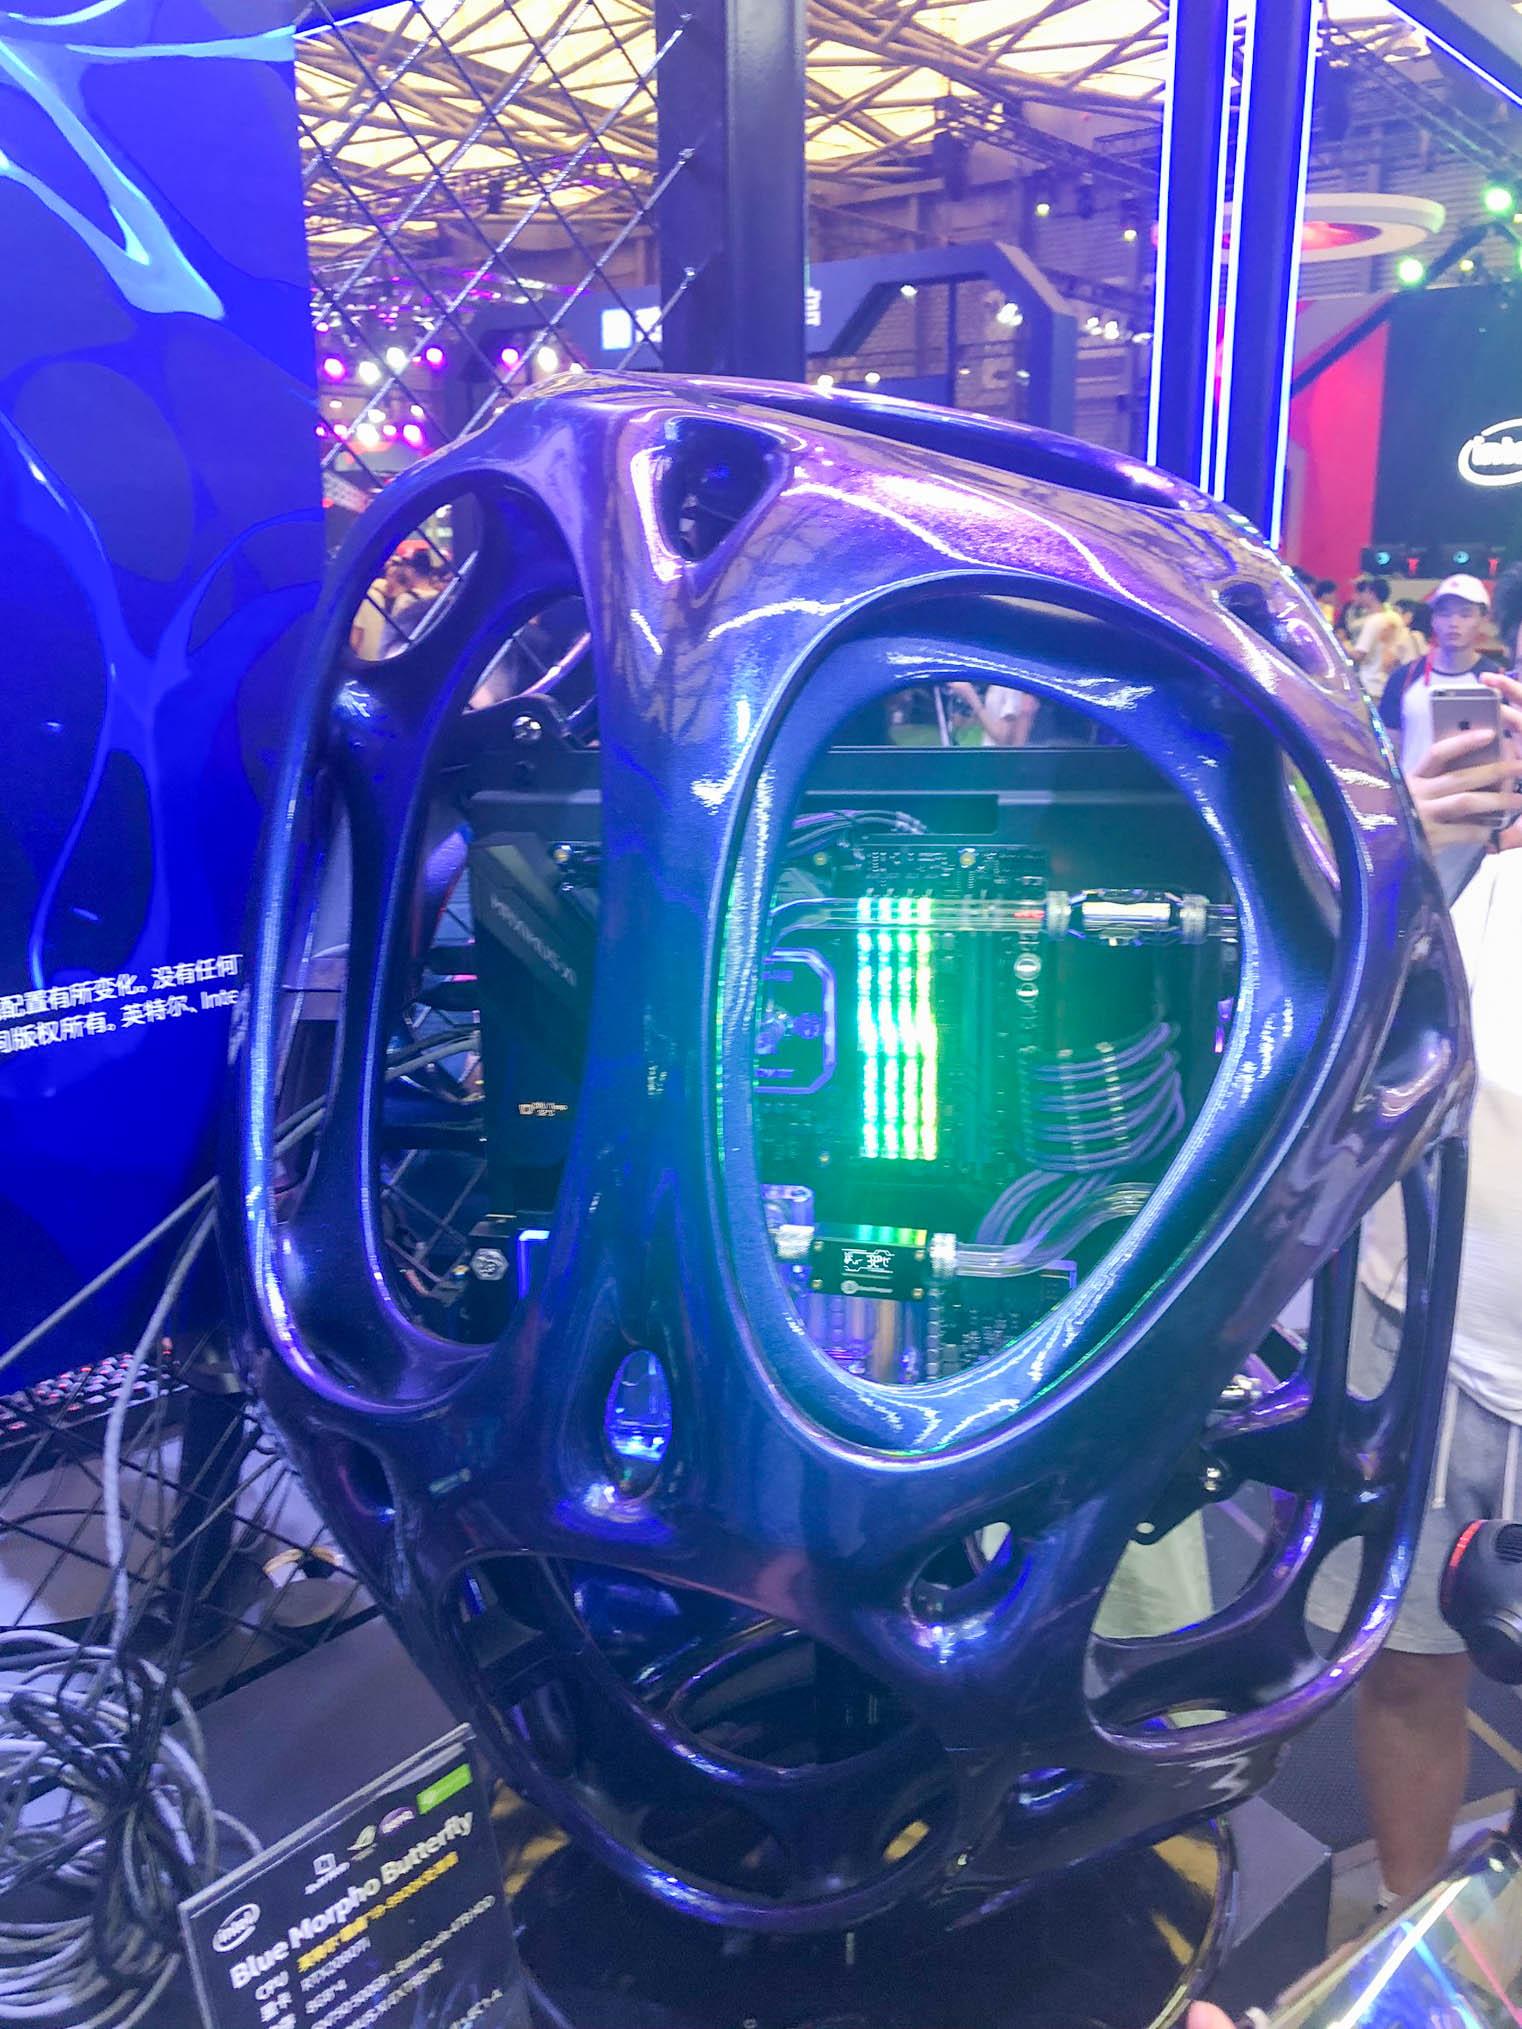 2019 ChinaJoy 中国国际数码互动娱乐展览会 游玩 第16张